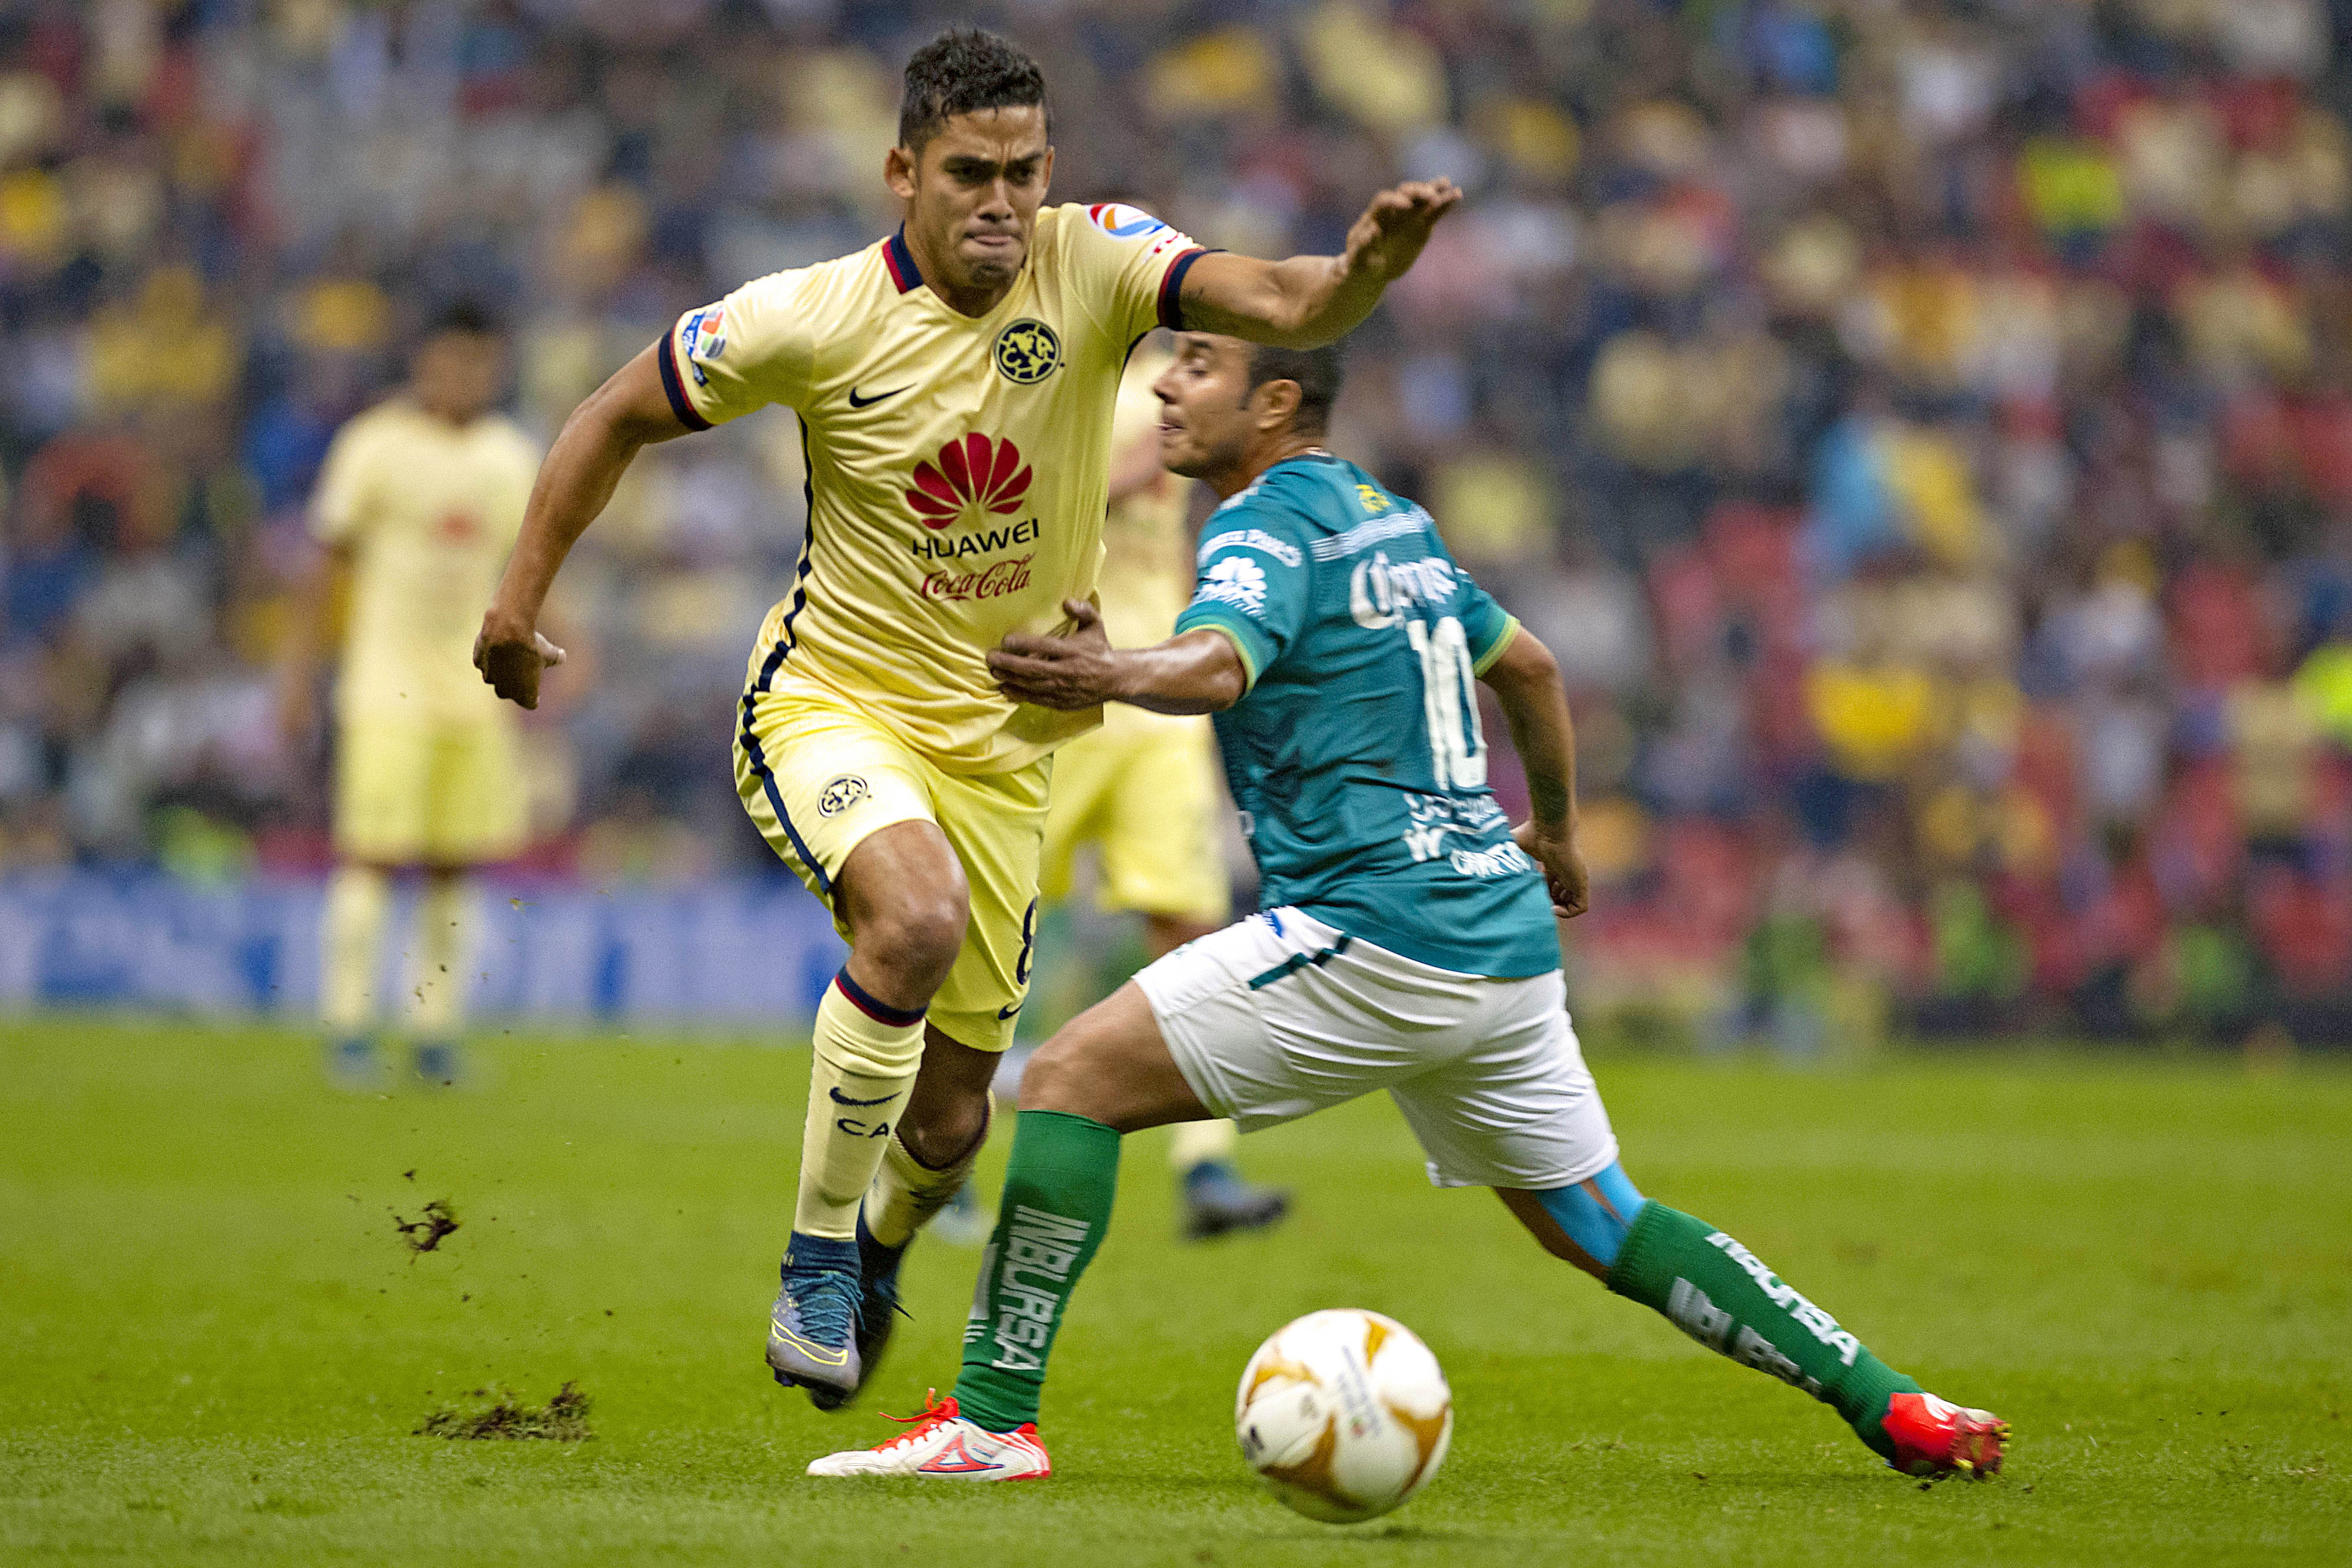 liga mx - photo #31